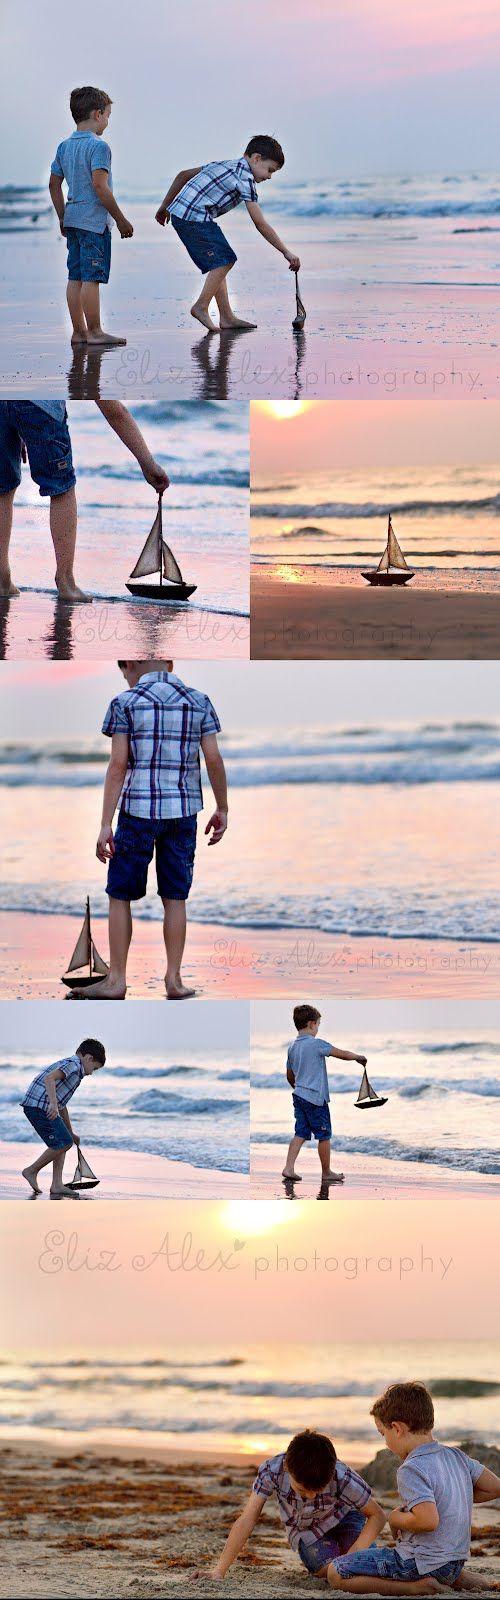 beach, boys and a boat at sunrise Eliz Alex Photography, Allen Texas child photographer, beach photography